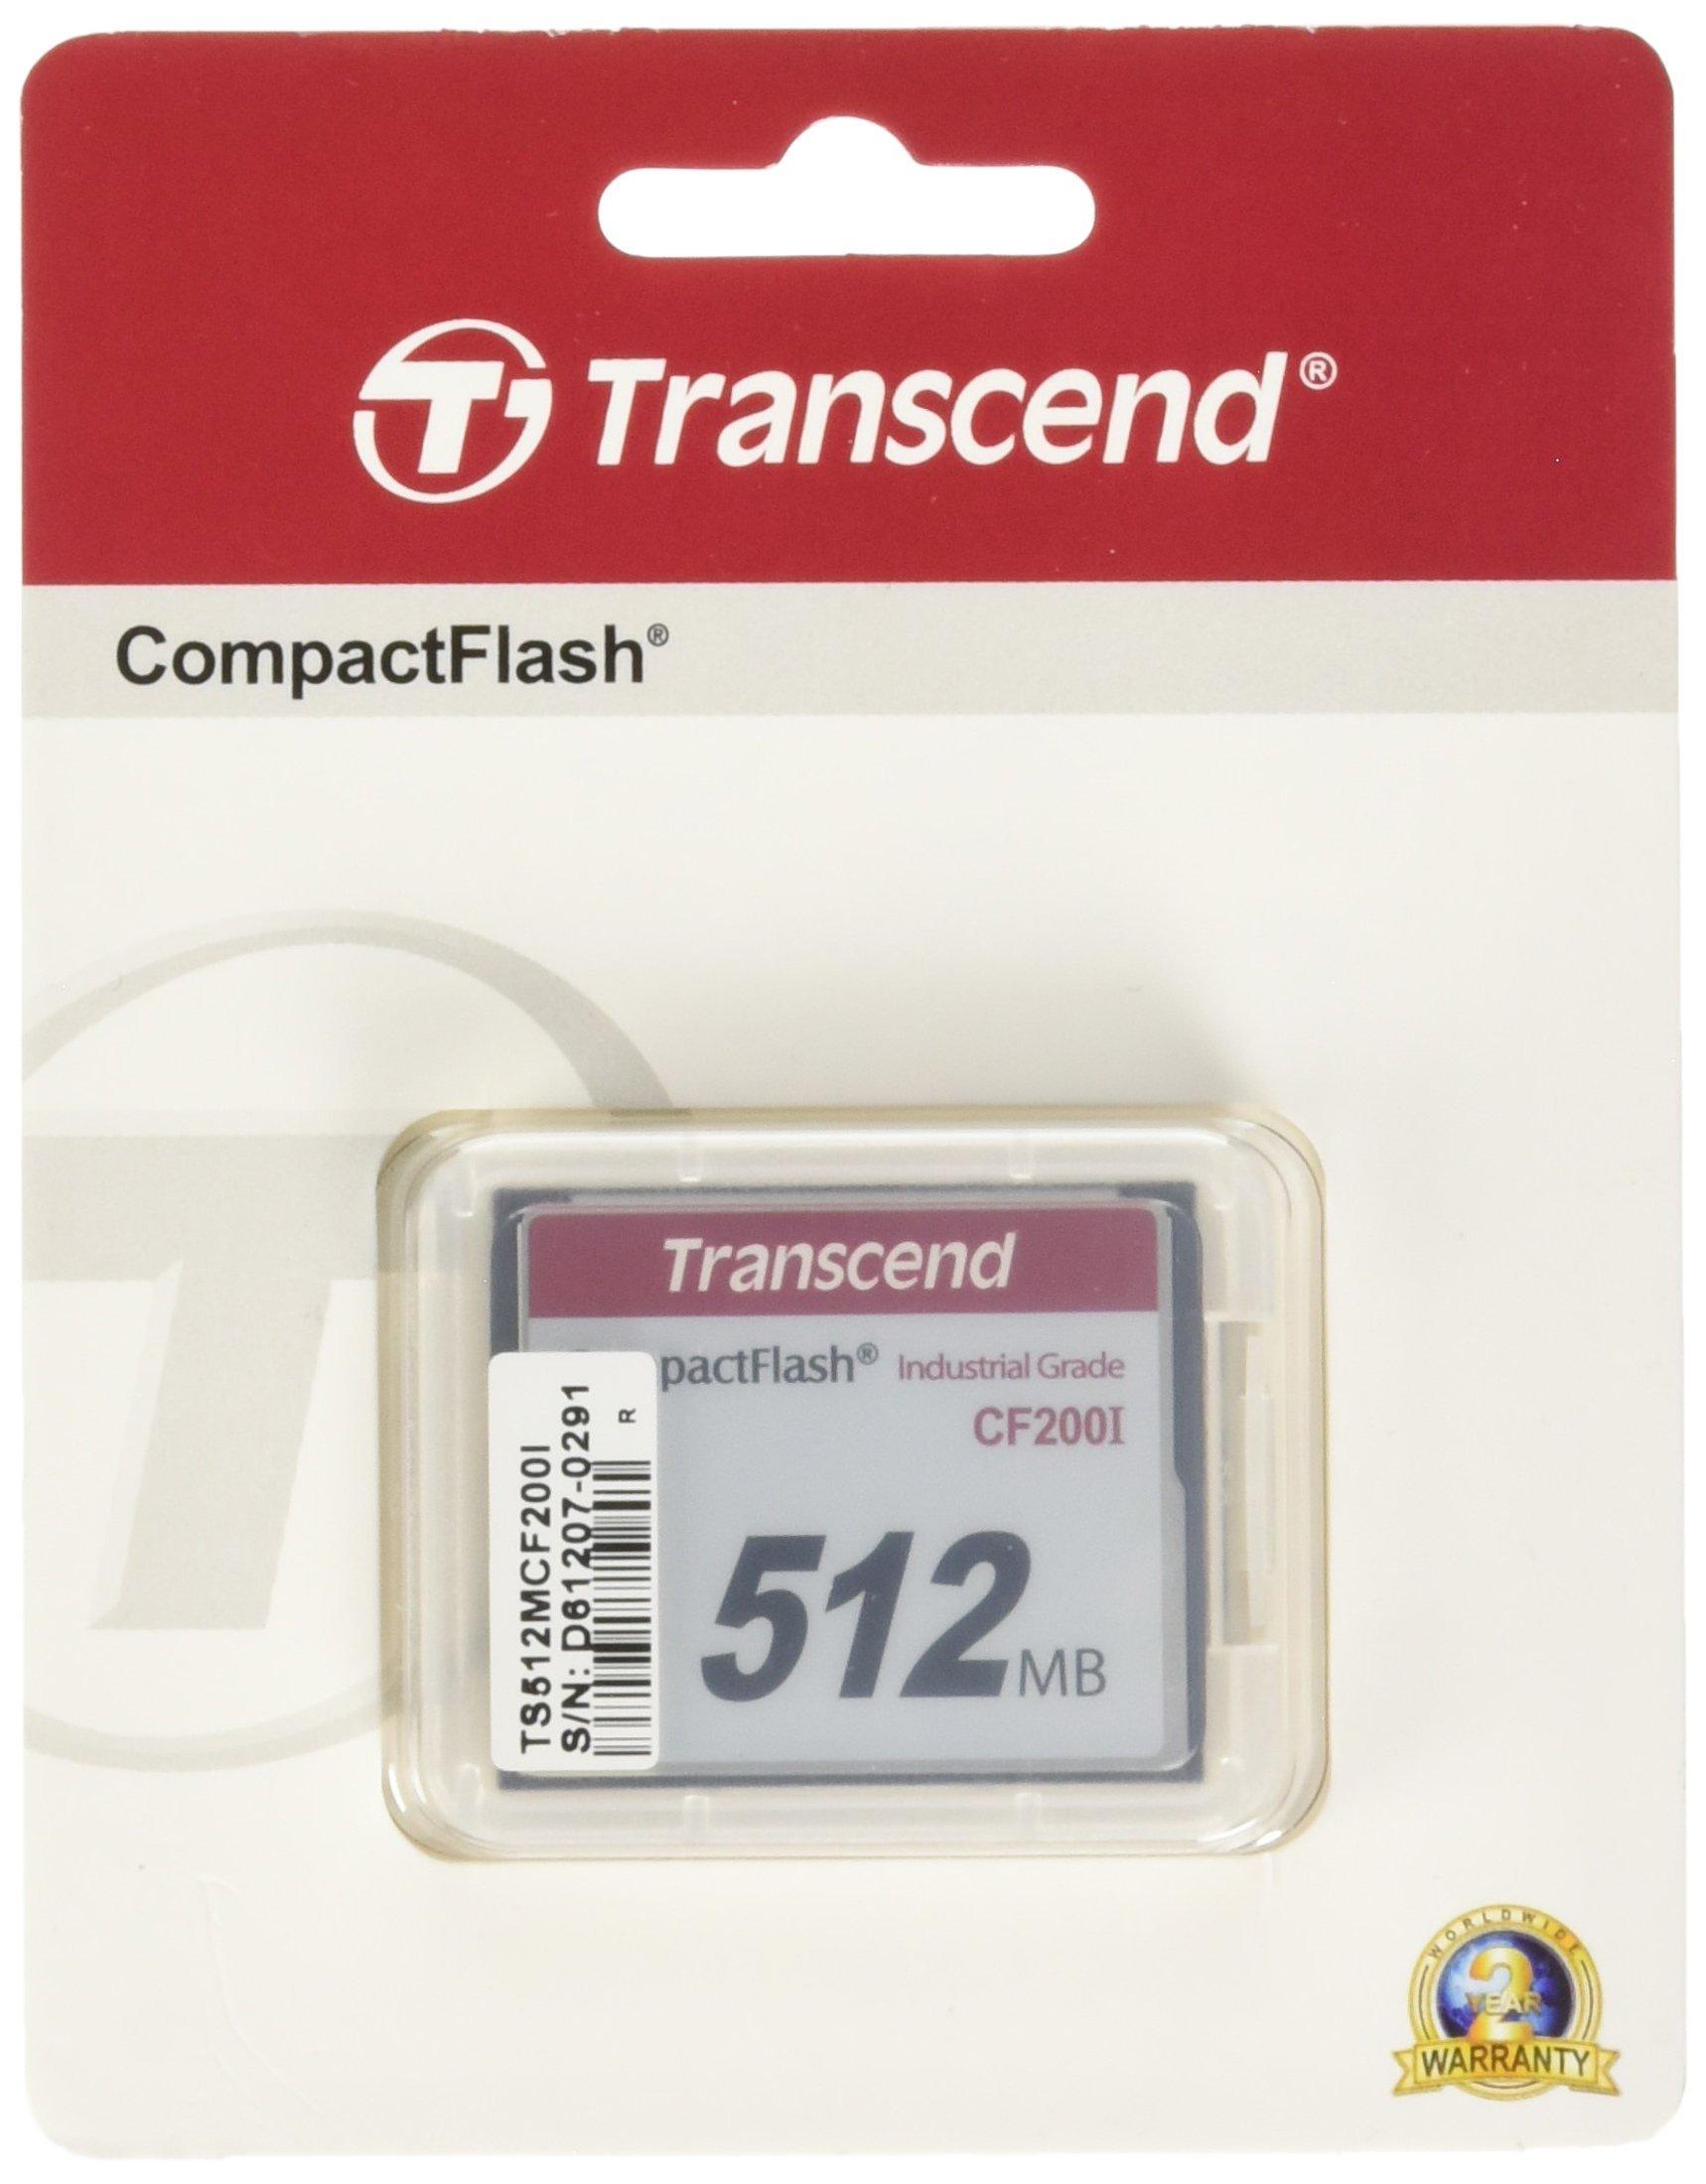 Transcend 512MB Industrial Compact Flash Card (TS512MCF200I)